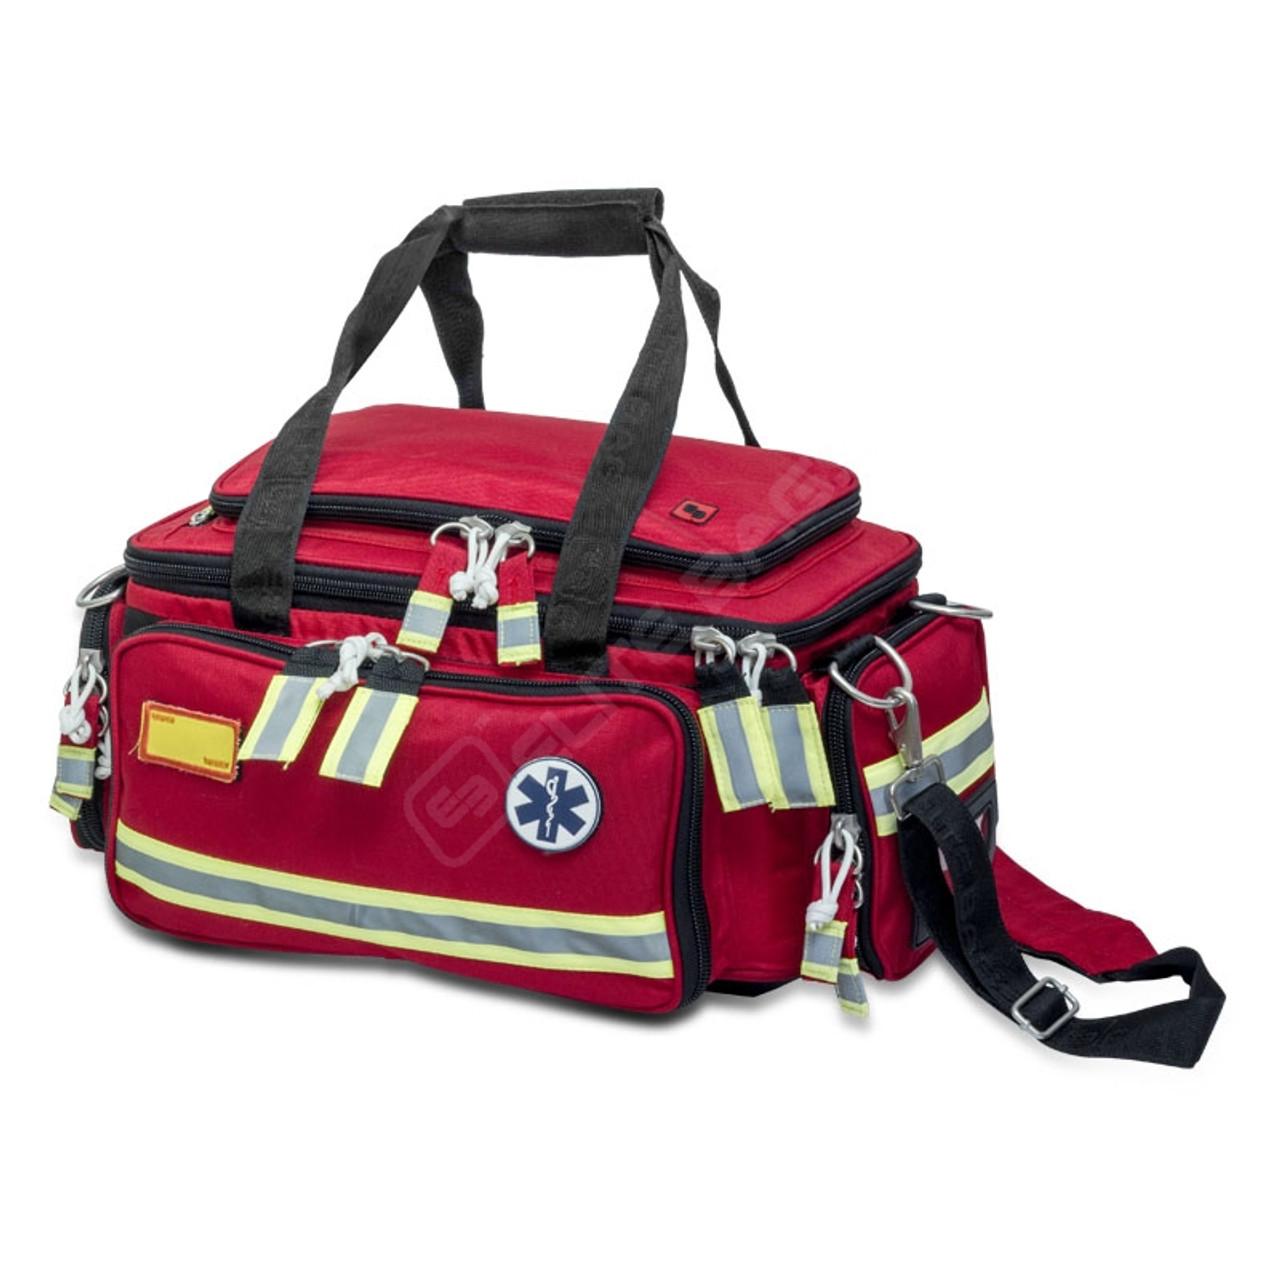 Elite Extreme's BLS Bag - Red